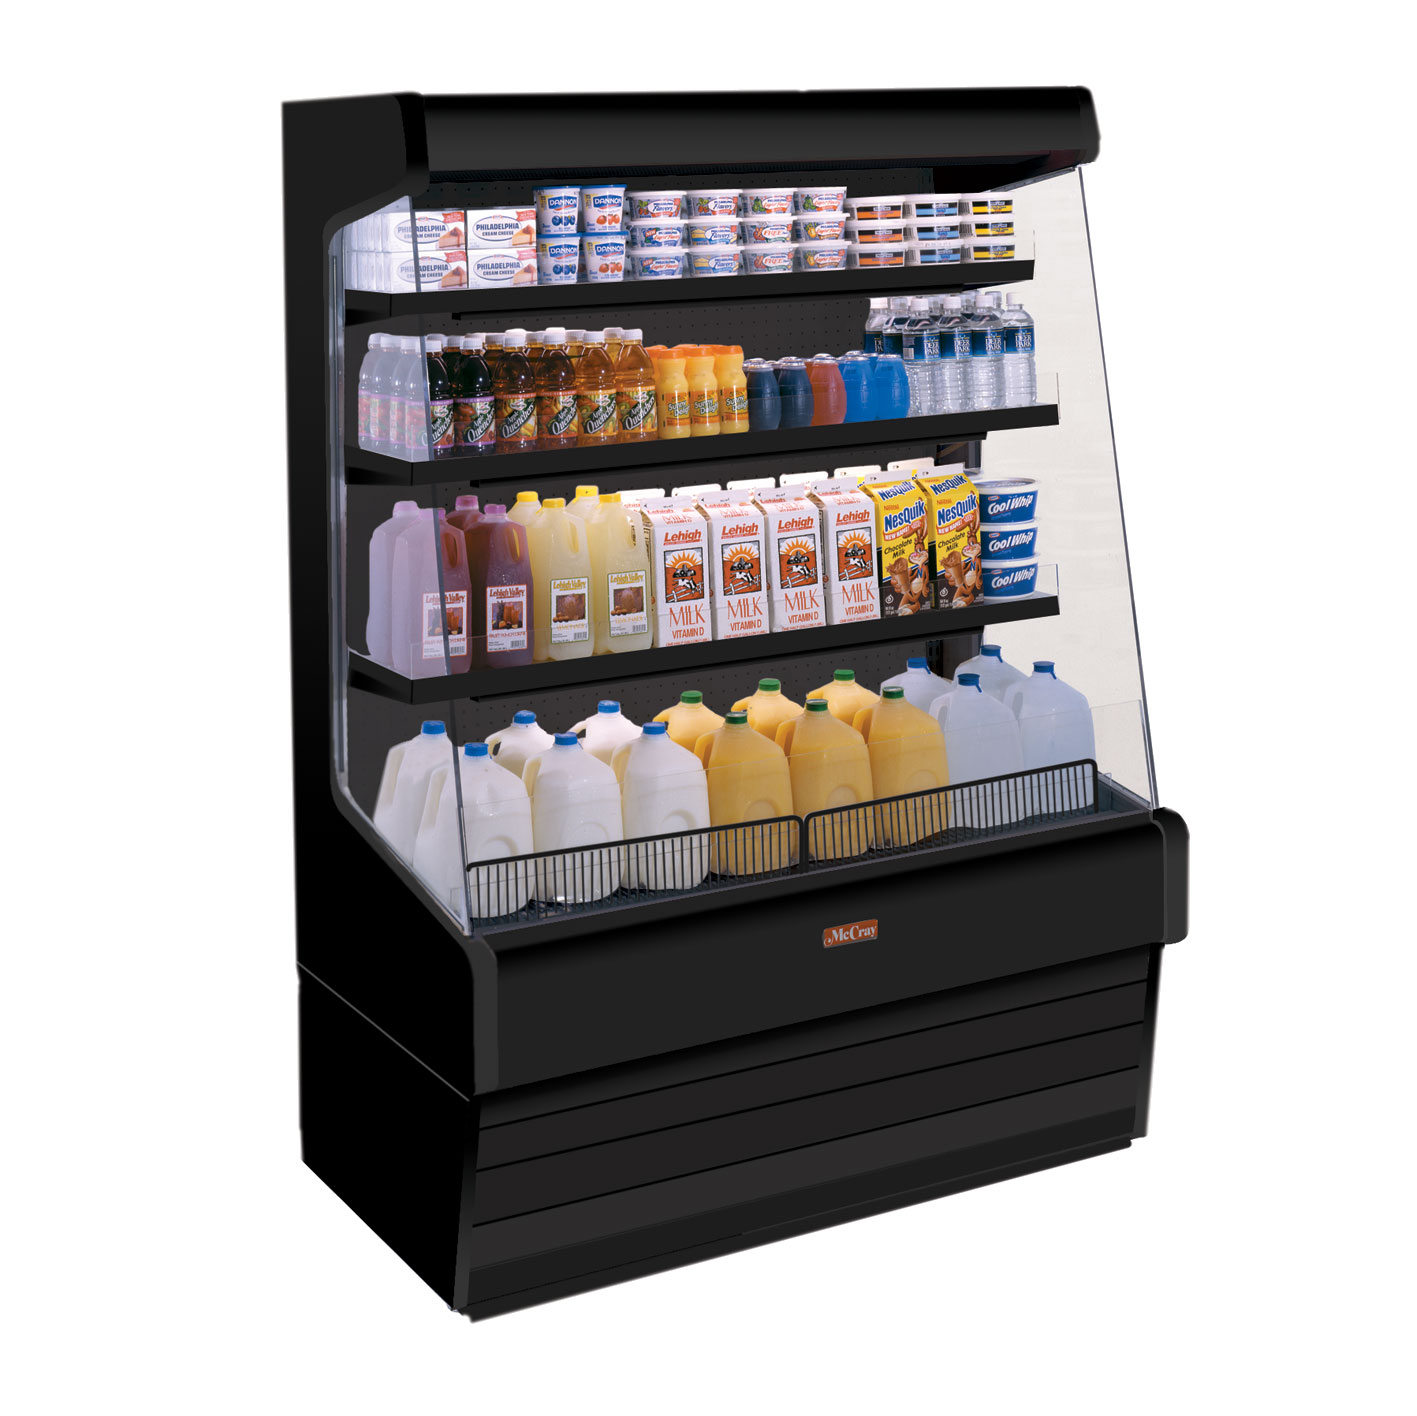 Howard-McCray SC-OD30E-6-B-LED merchandiser, open refrigerated display